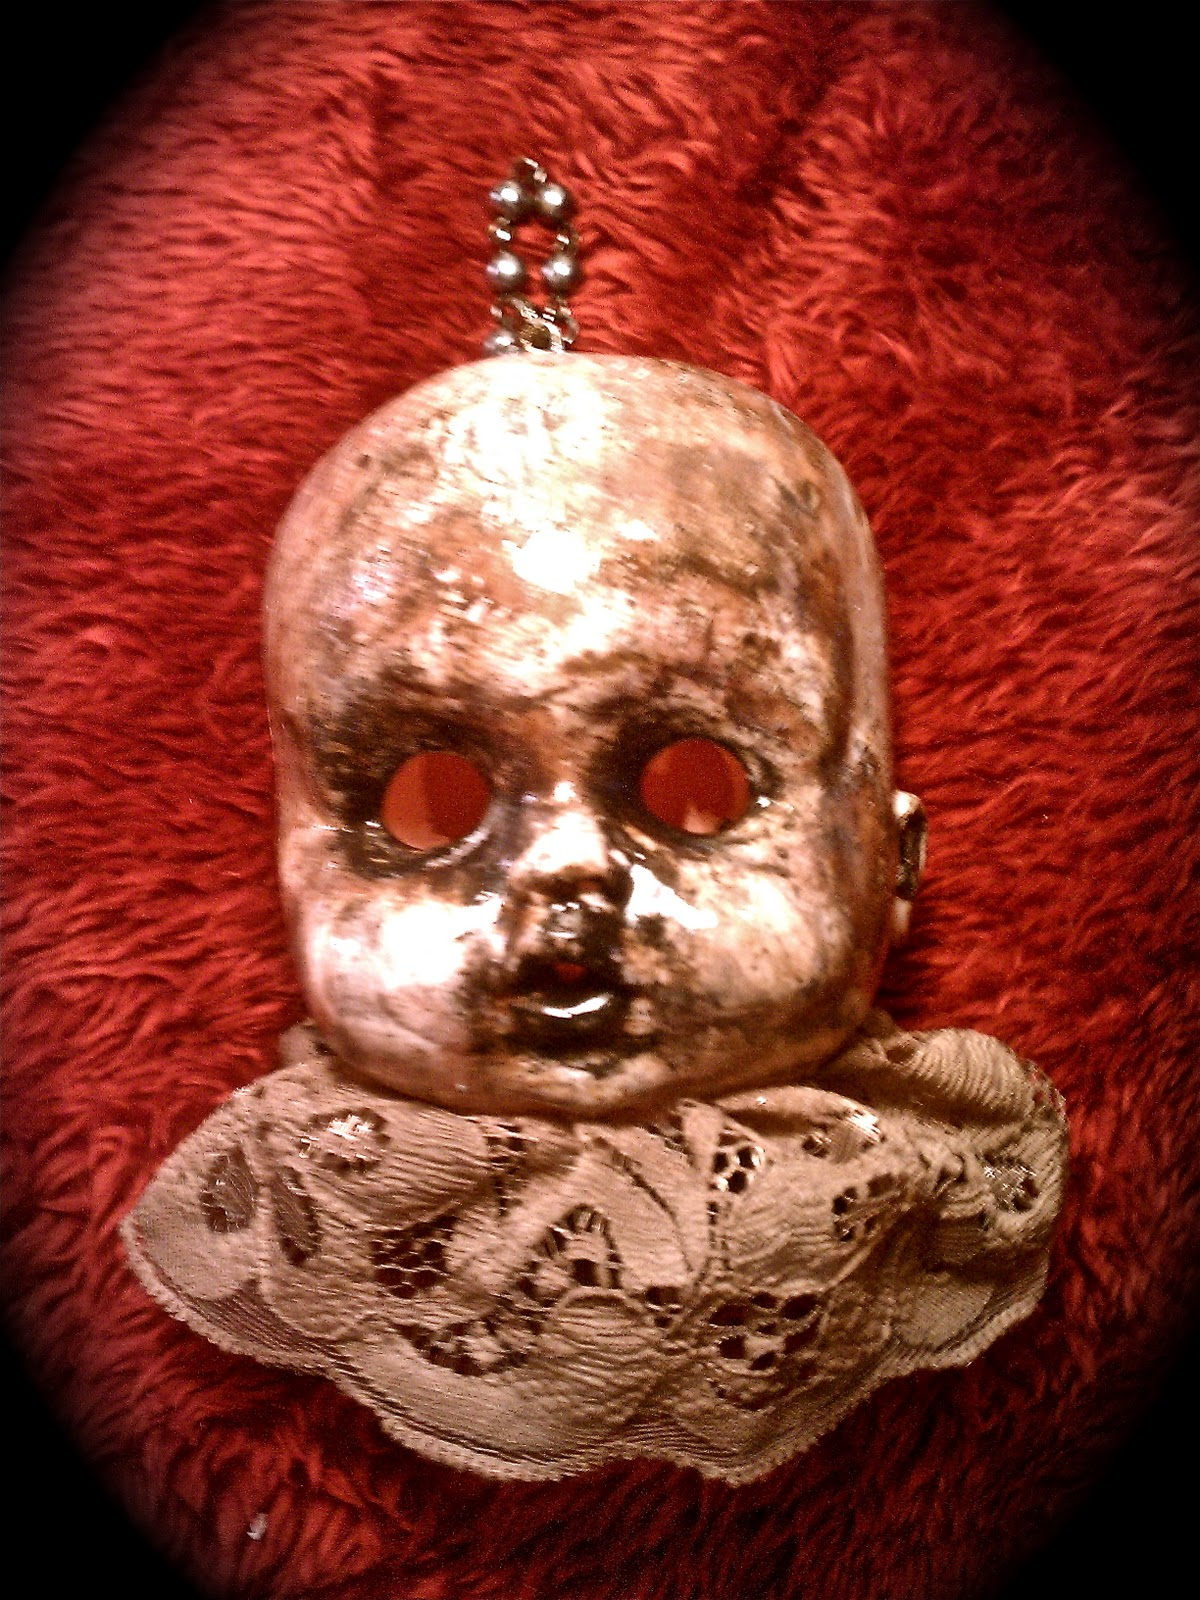 Morbid Curiosities Creepy Christmas Ornaments